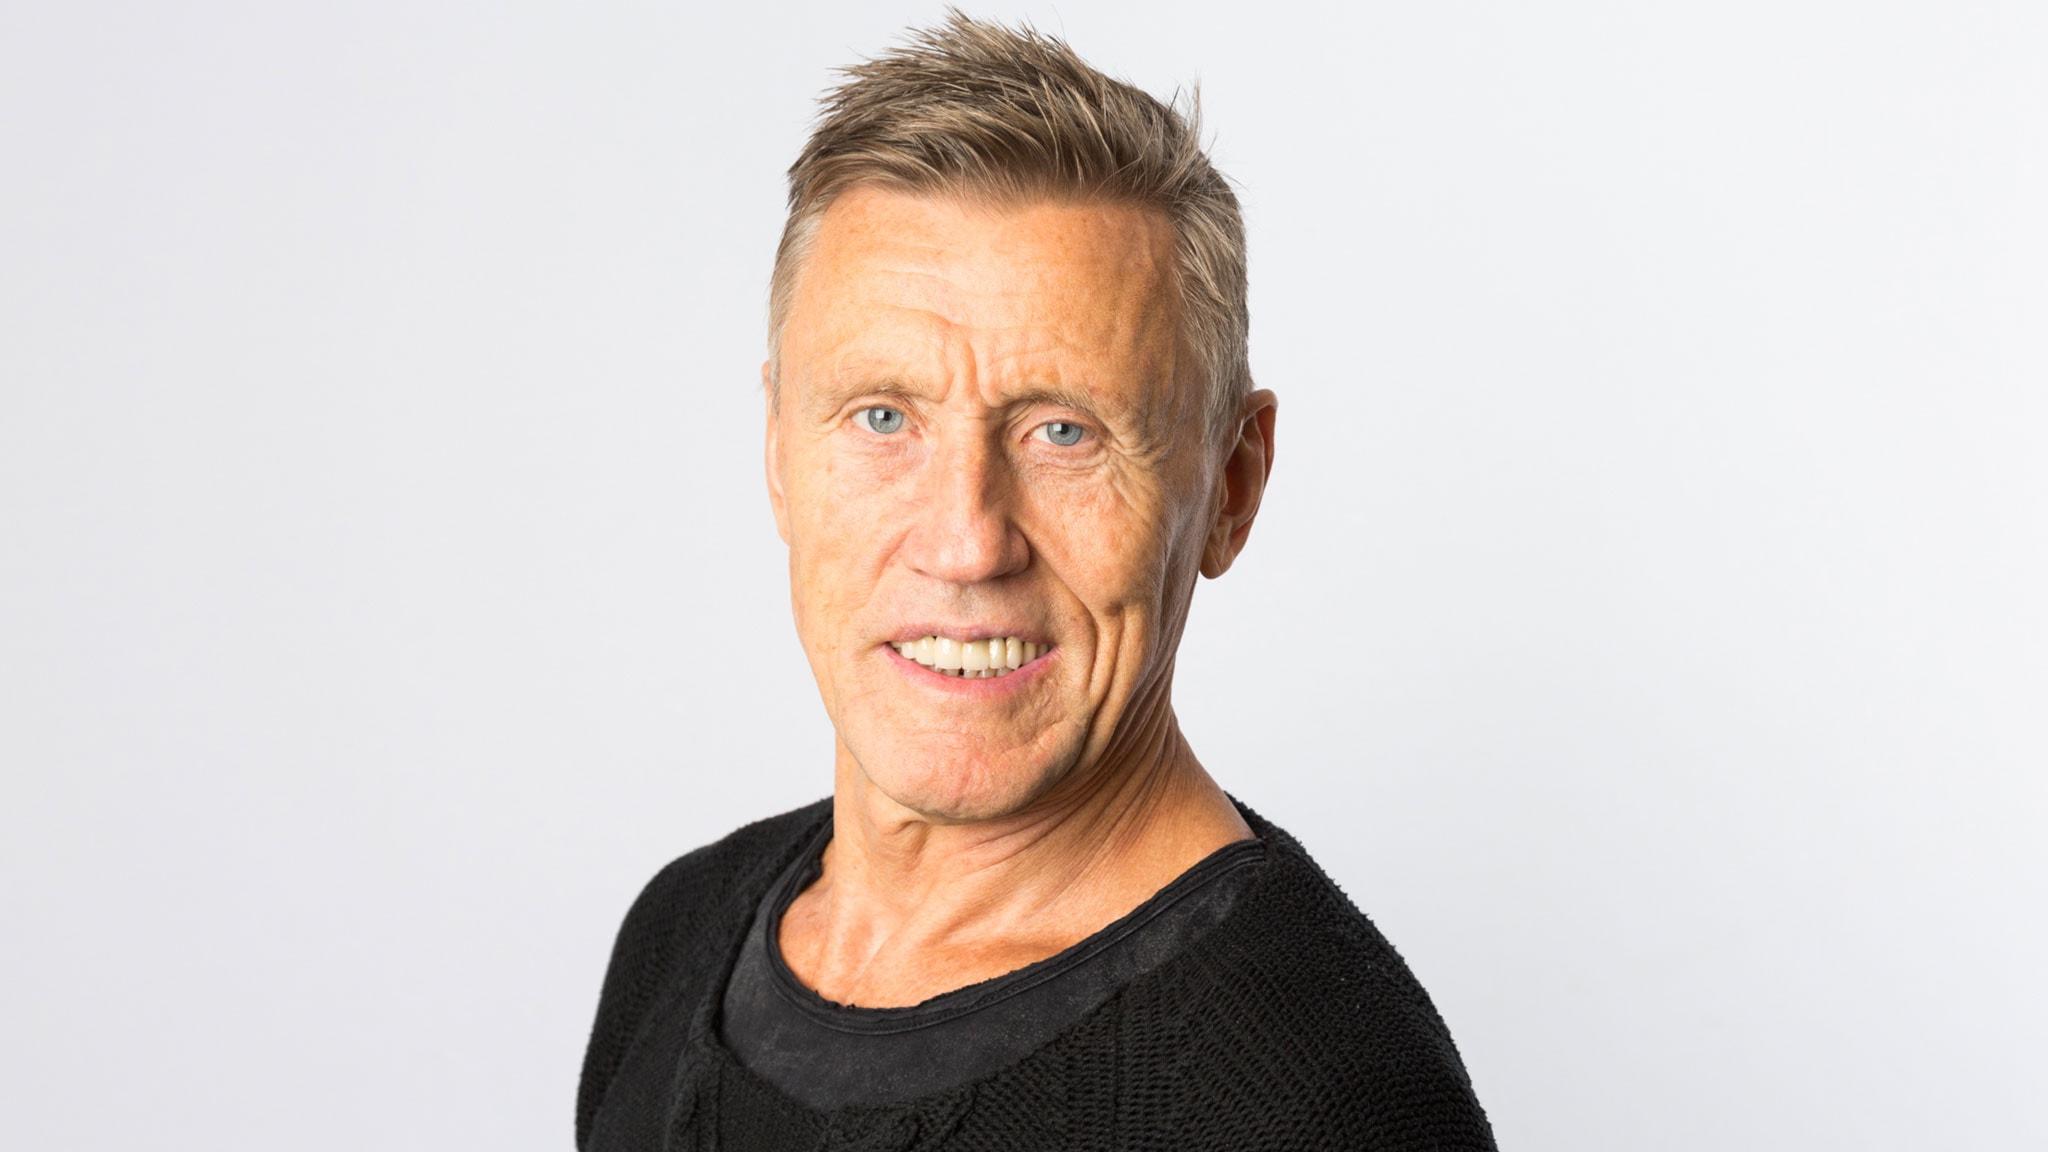 Börje Salming. Foto: Mattias Ahlm/Sveriges Radio